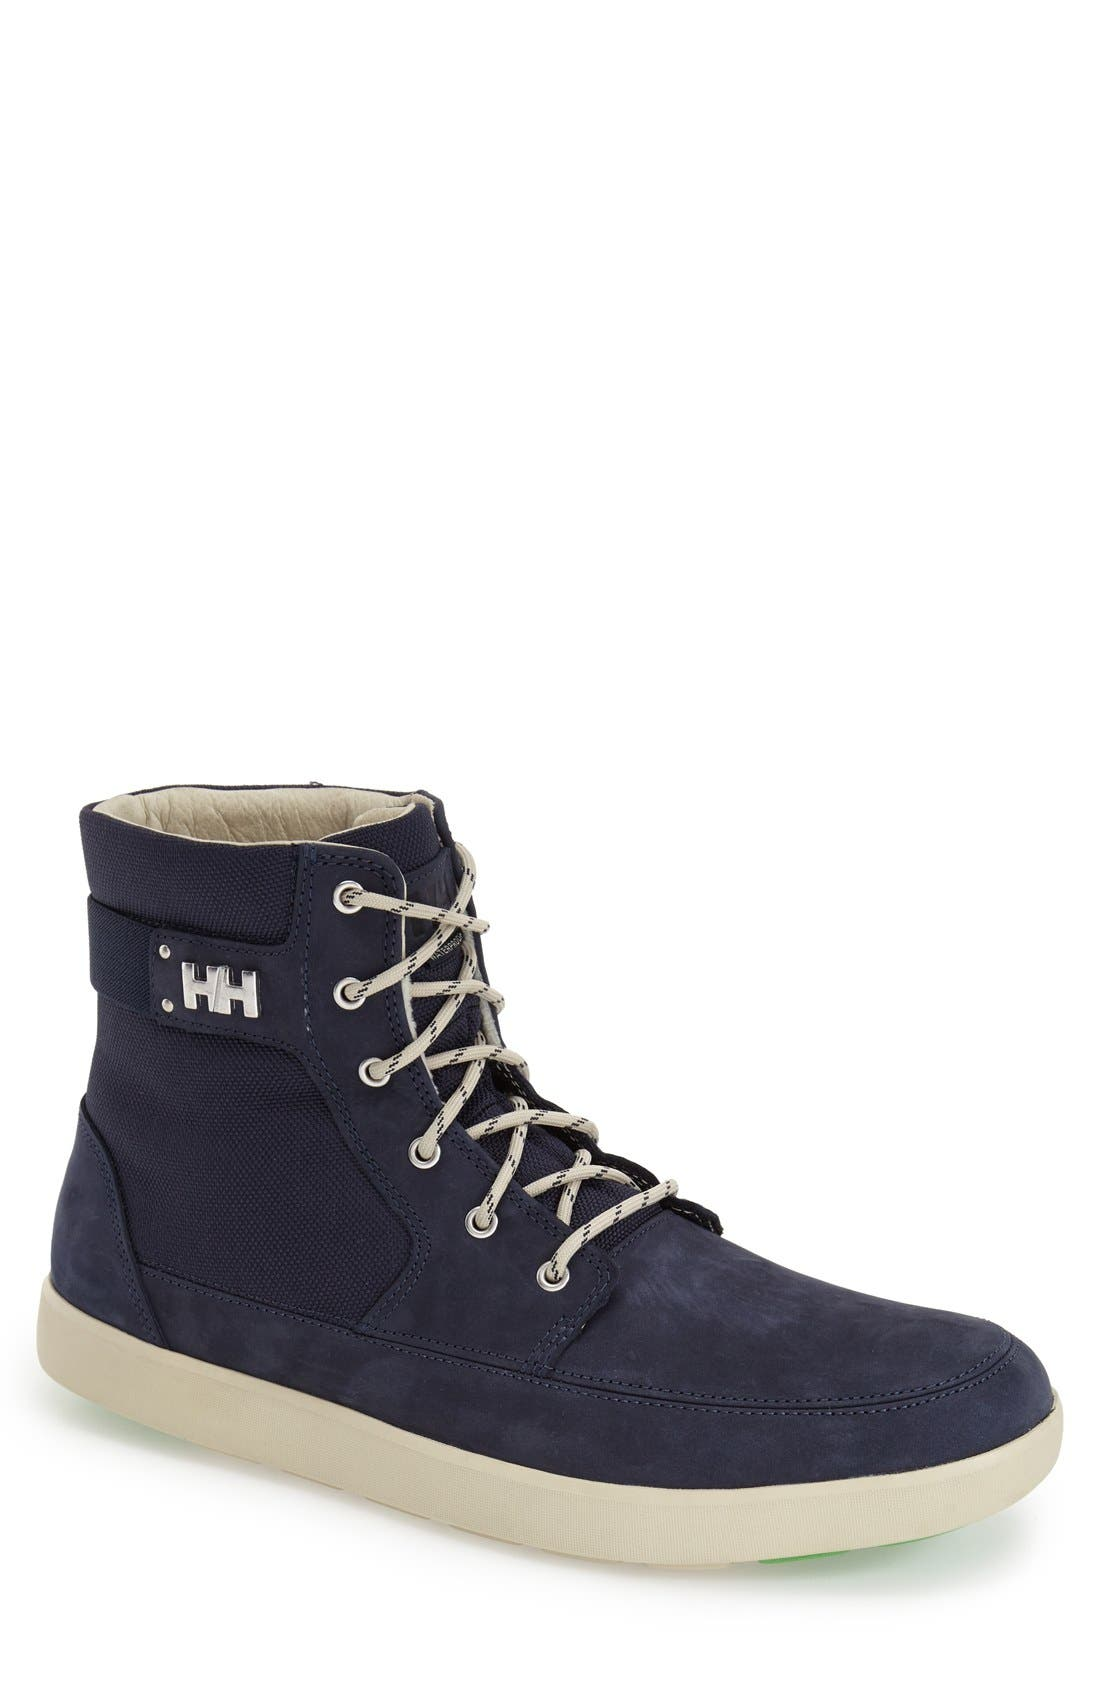 Helly Hansen 'Stockholm' Waterproof High Top Sneaker (Men)